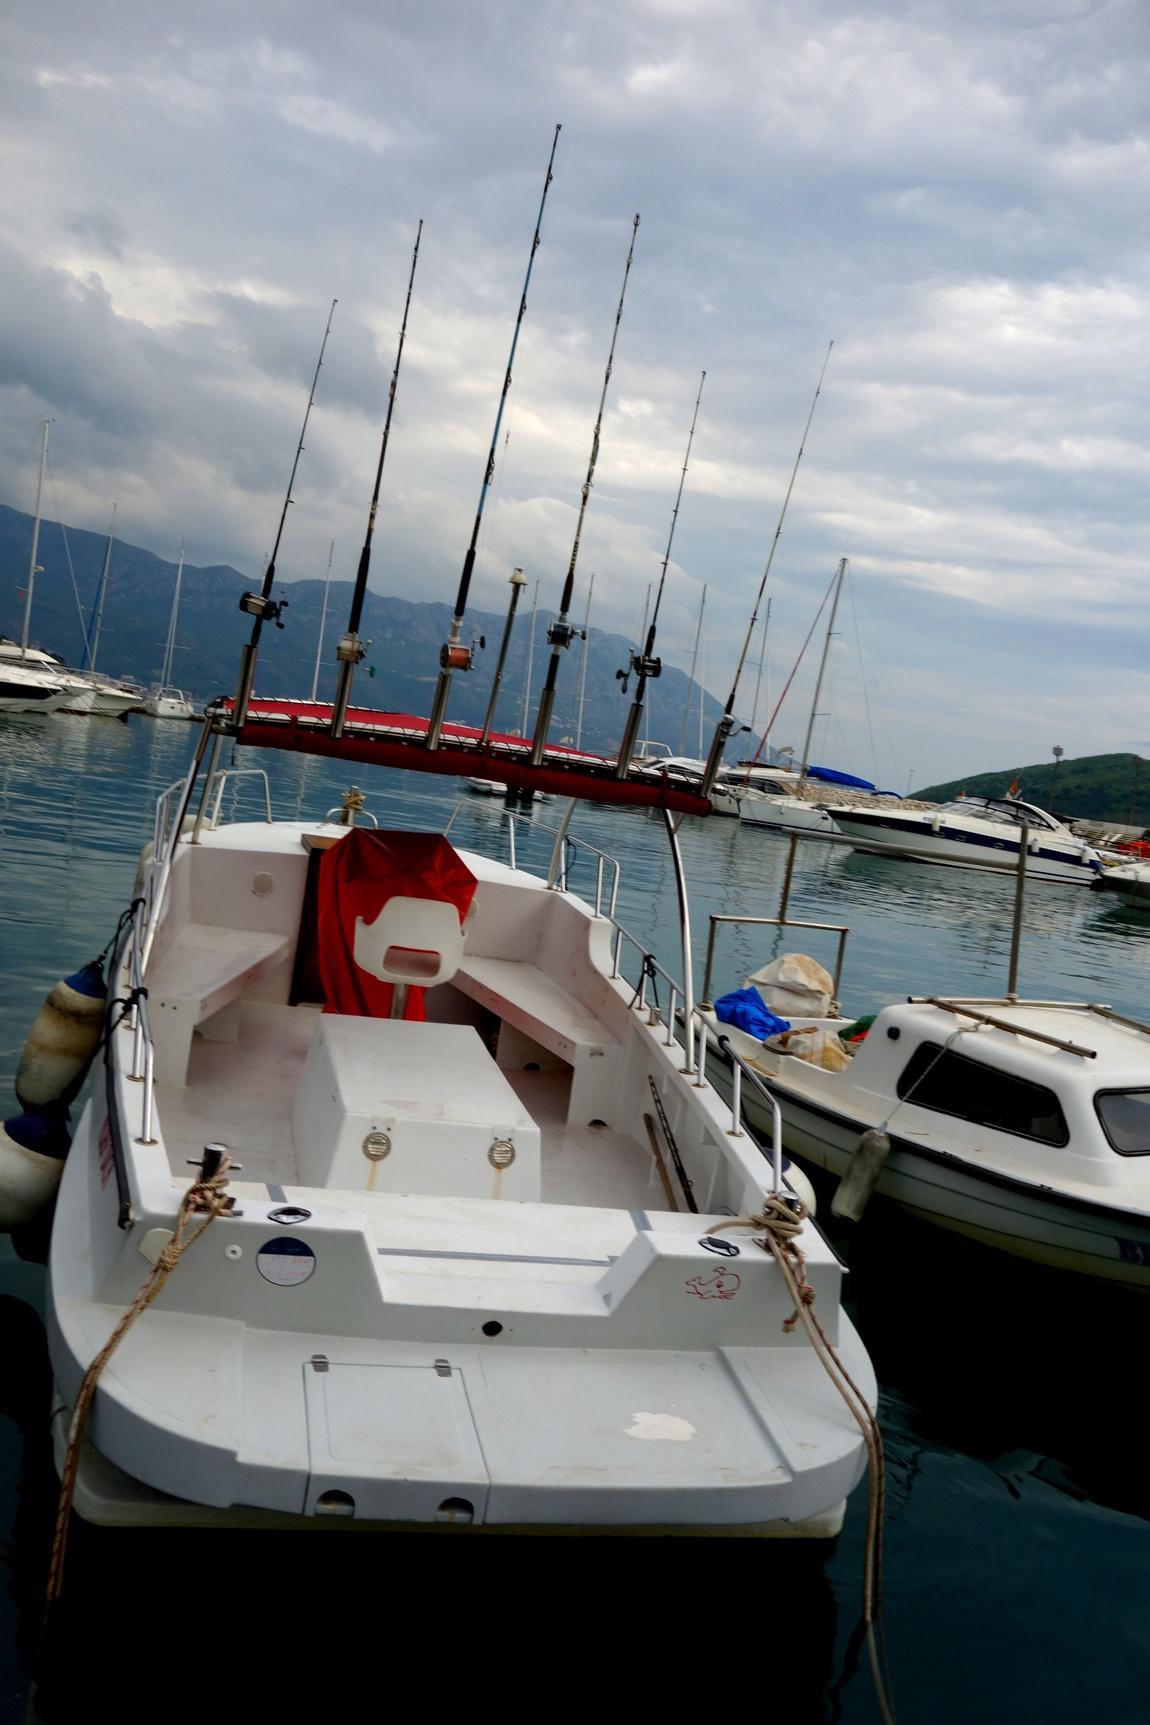 Будва - гавань, лодка с автоматическими удочками